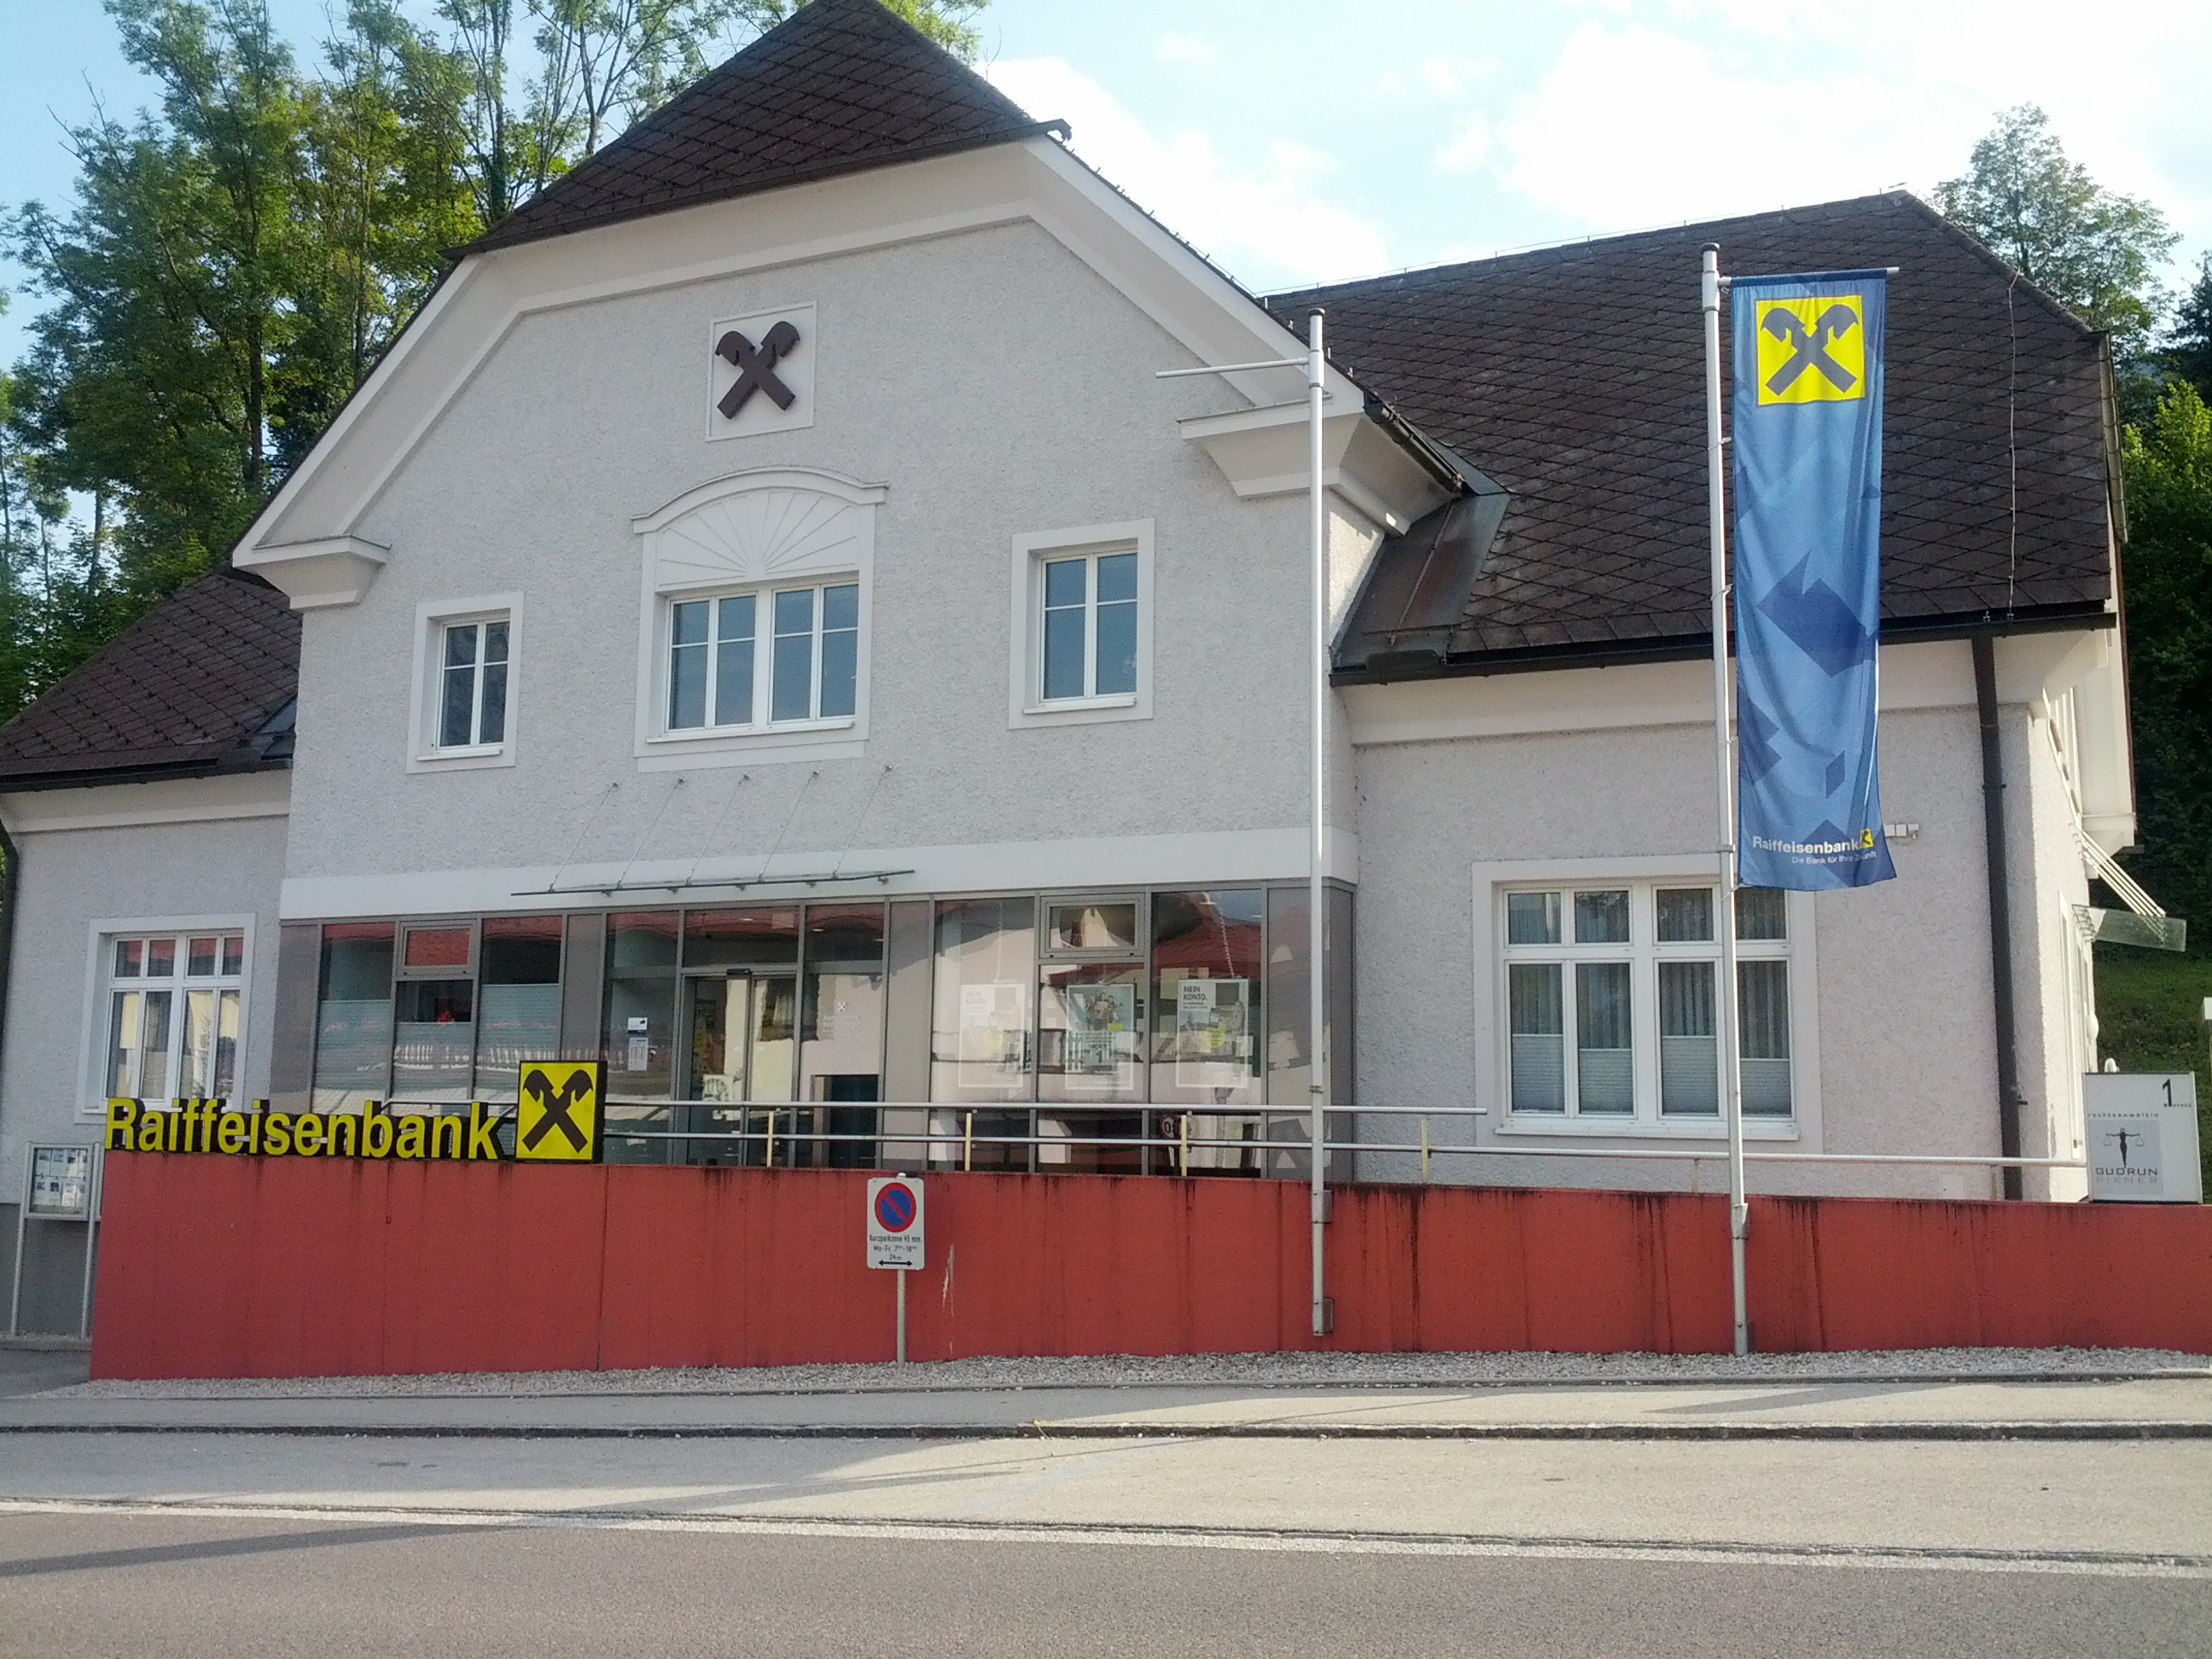 Raiffeisenbank Salzkammergut reg. Gen. m. b. H. Zws. Traunkirchen - Winkl